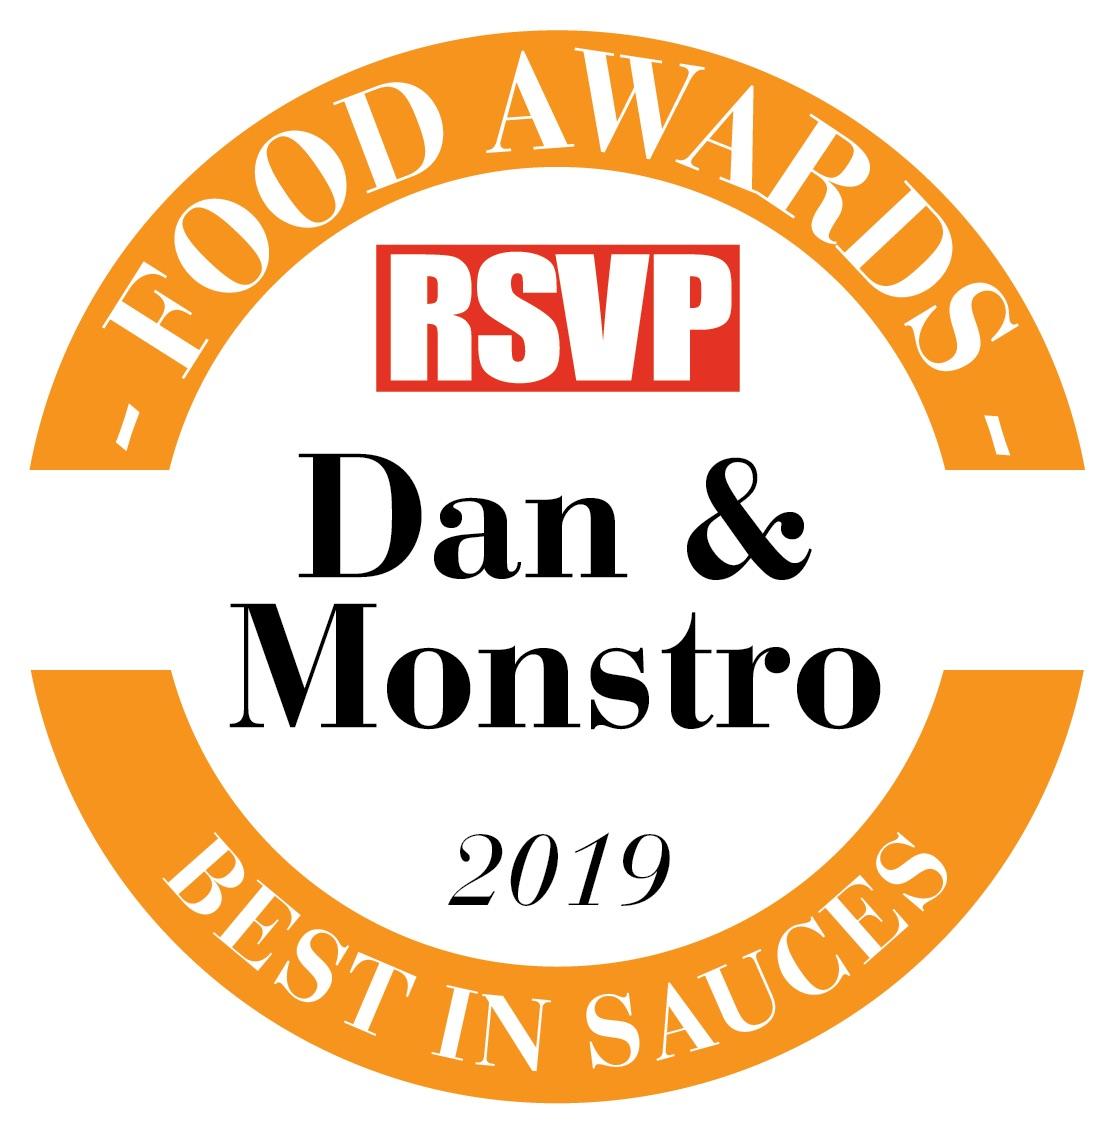 Food Awards - Best in Sauces 2019